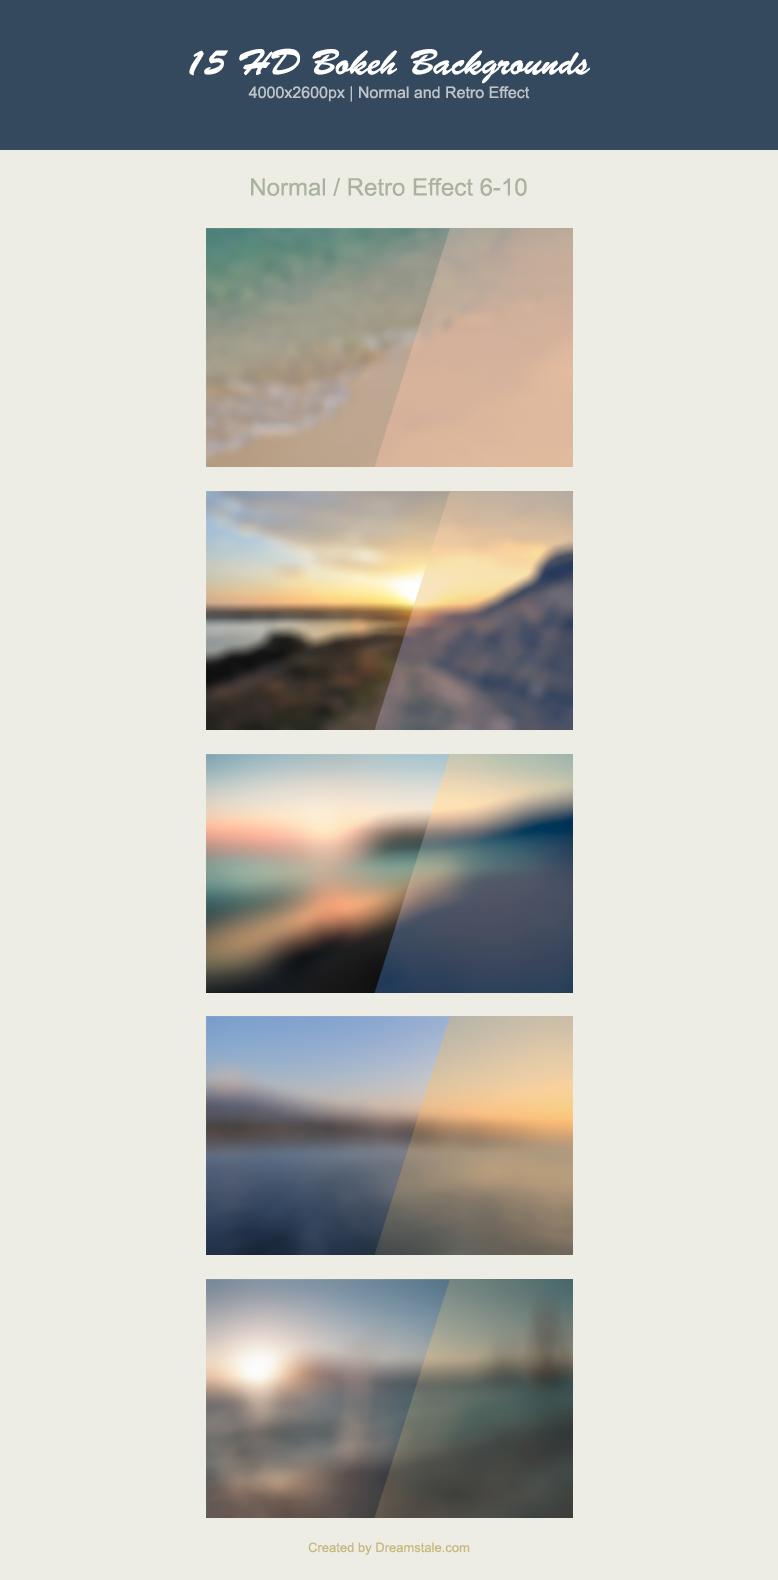 download 15 hd premium bokeh backgrounds - preview 2